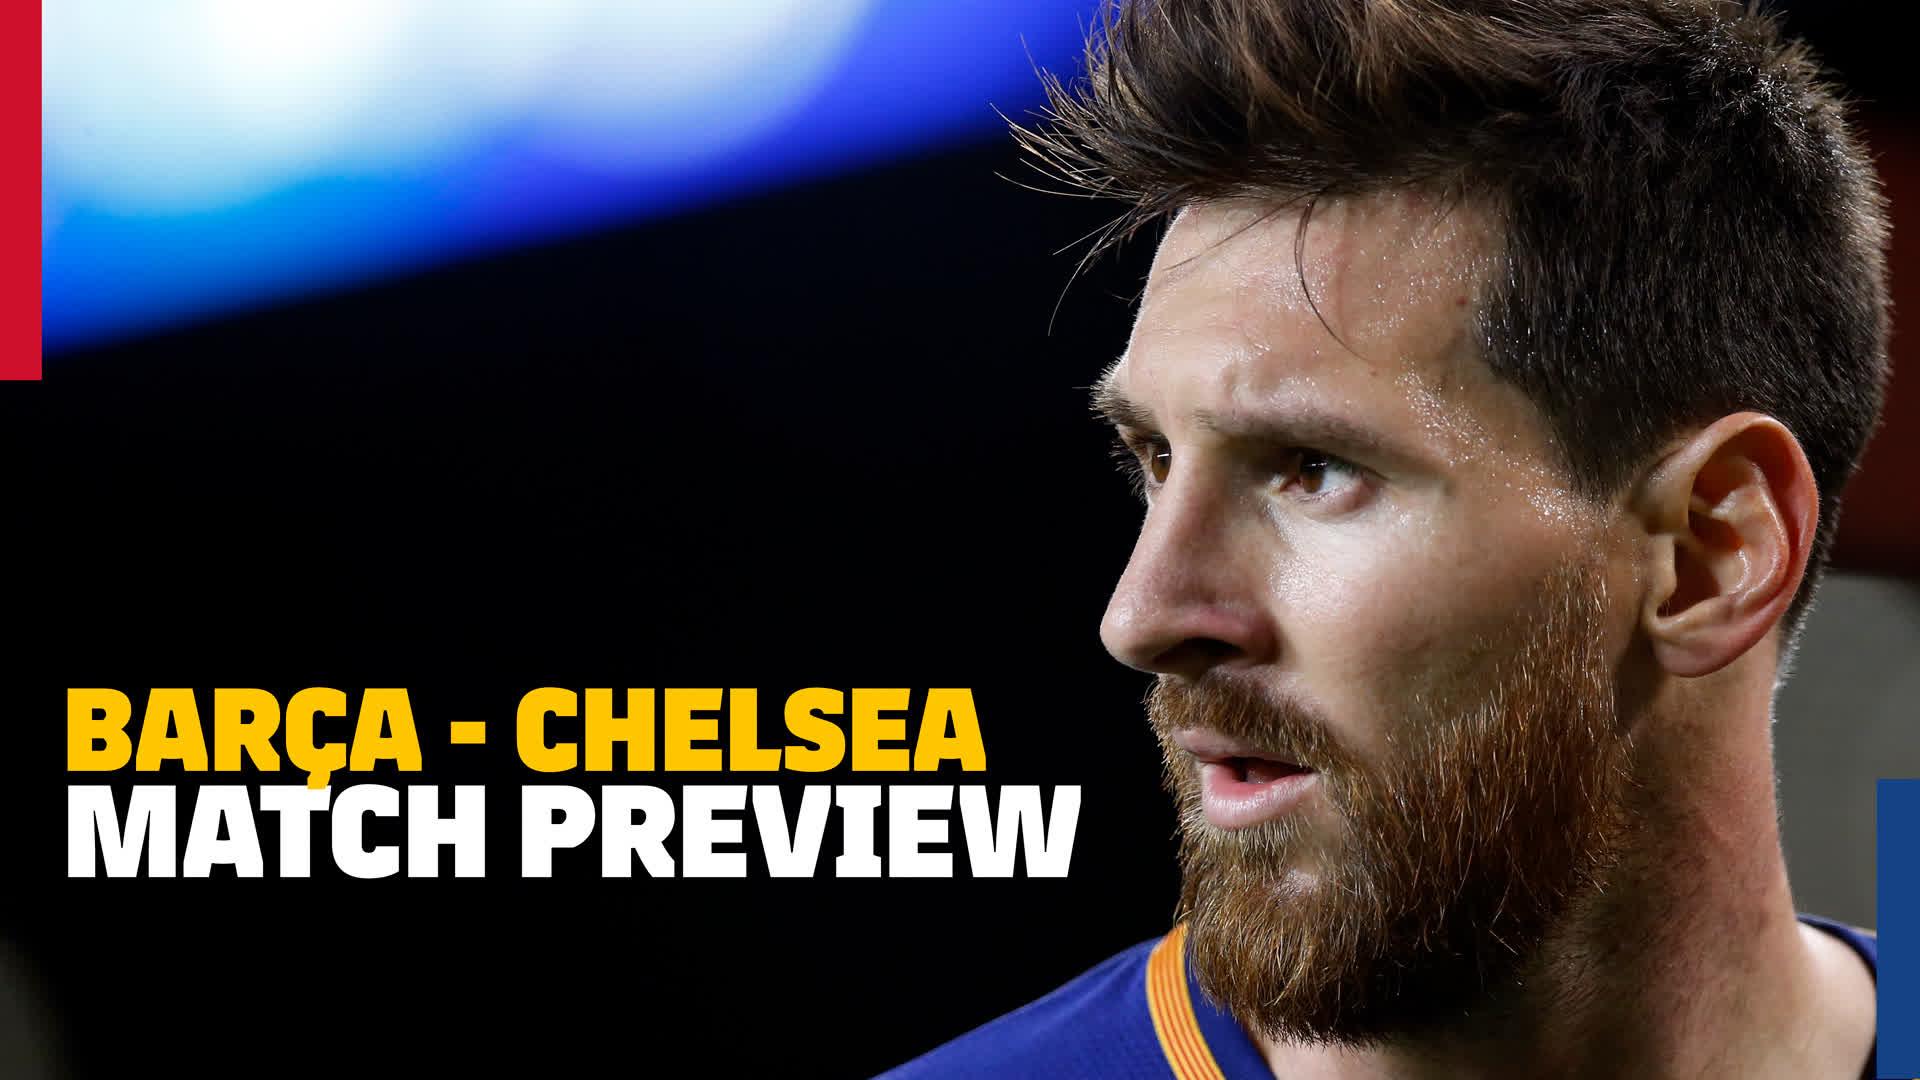 ⚽️ #BarçaChelsea �� MATCH PREVIEW �� Ready! �� Full story: https://t.co/e0HrSDu05A ���� https://t.co/RiTOY0c6FK